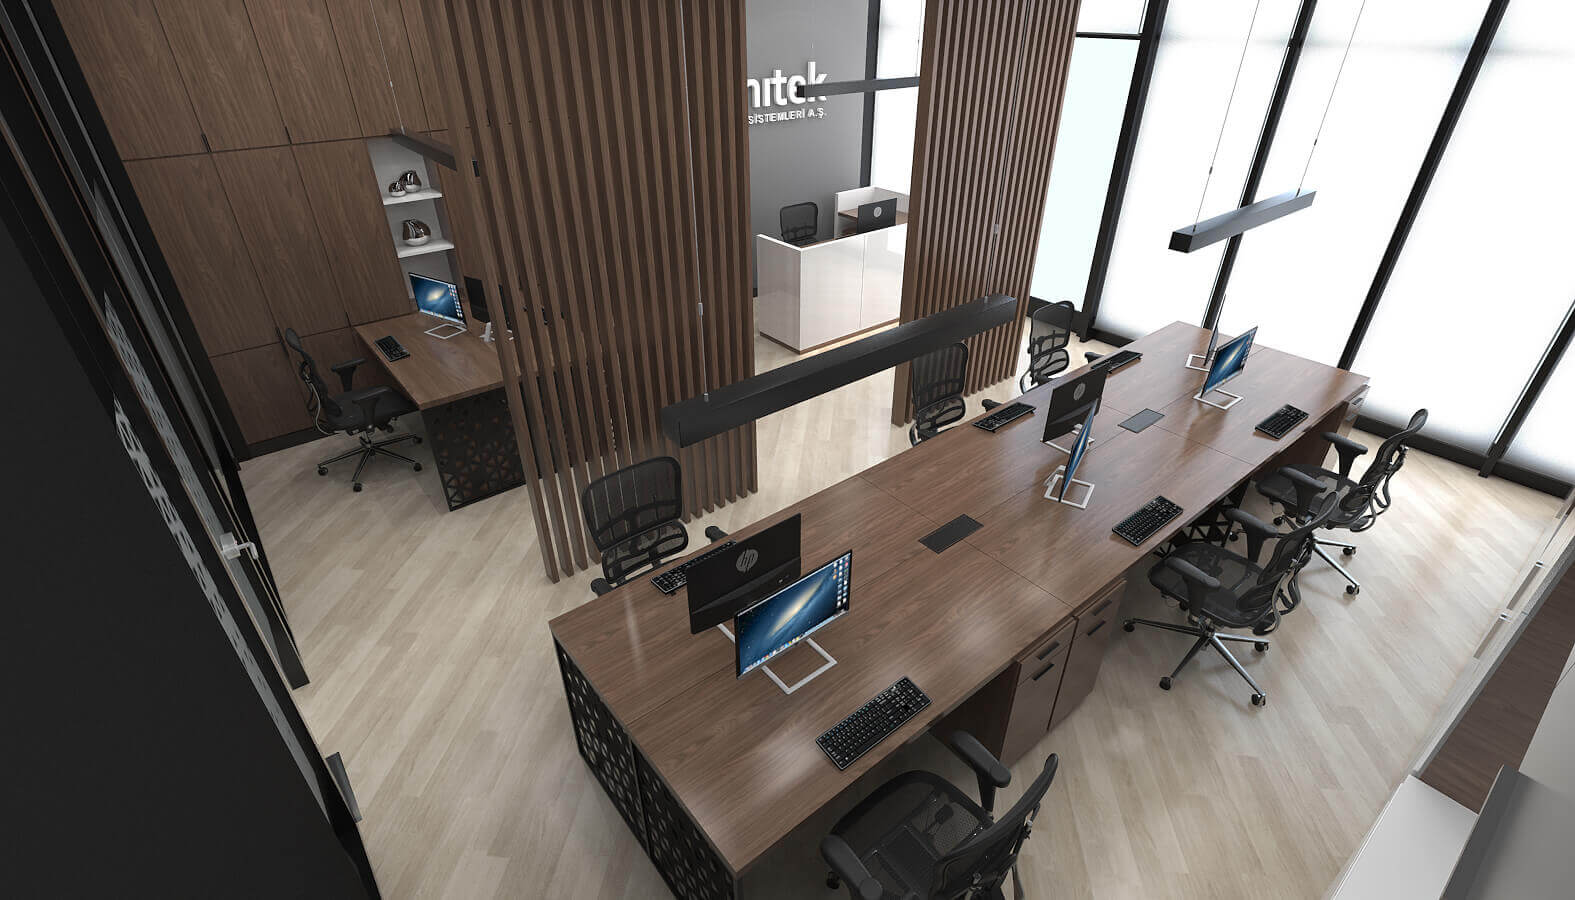 ODTÜ Teknokent 3779 Tanitek Offices